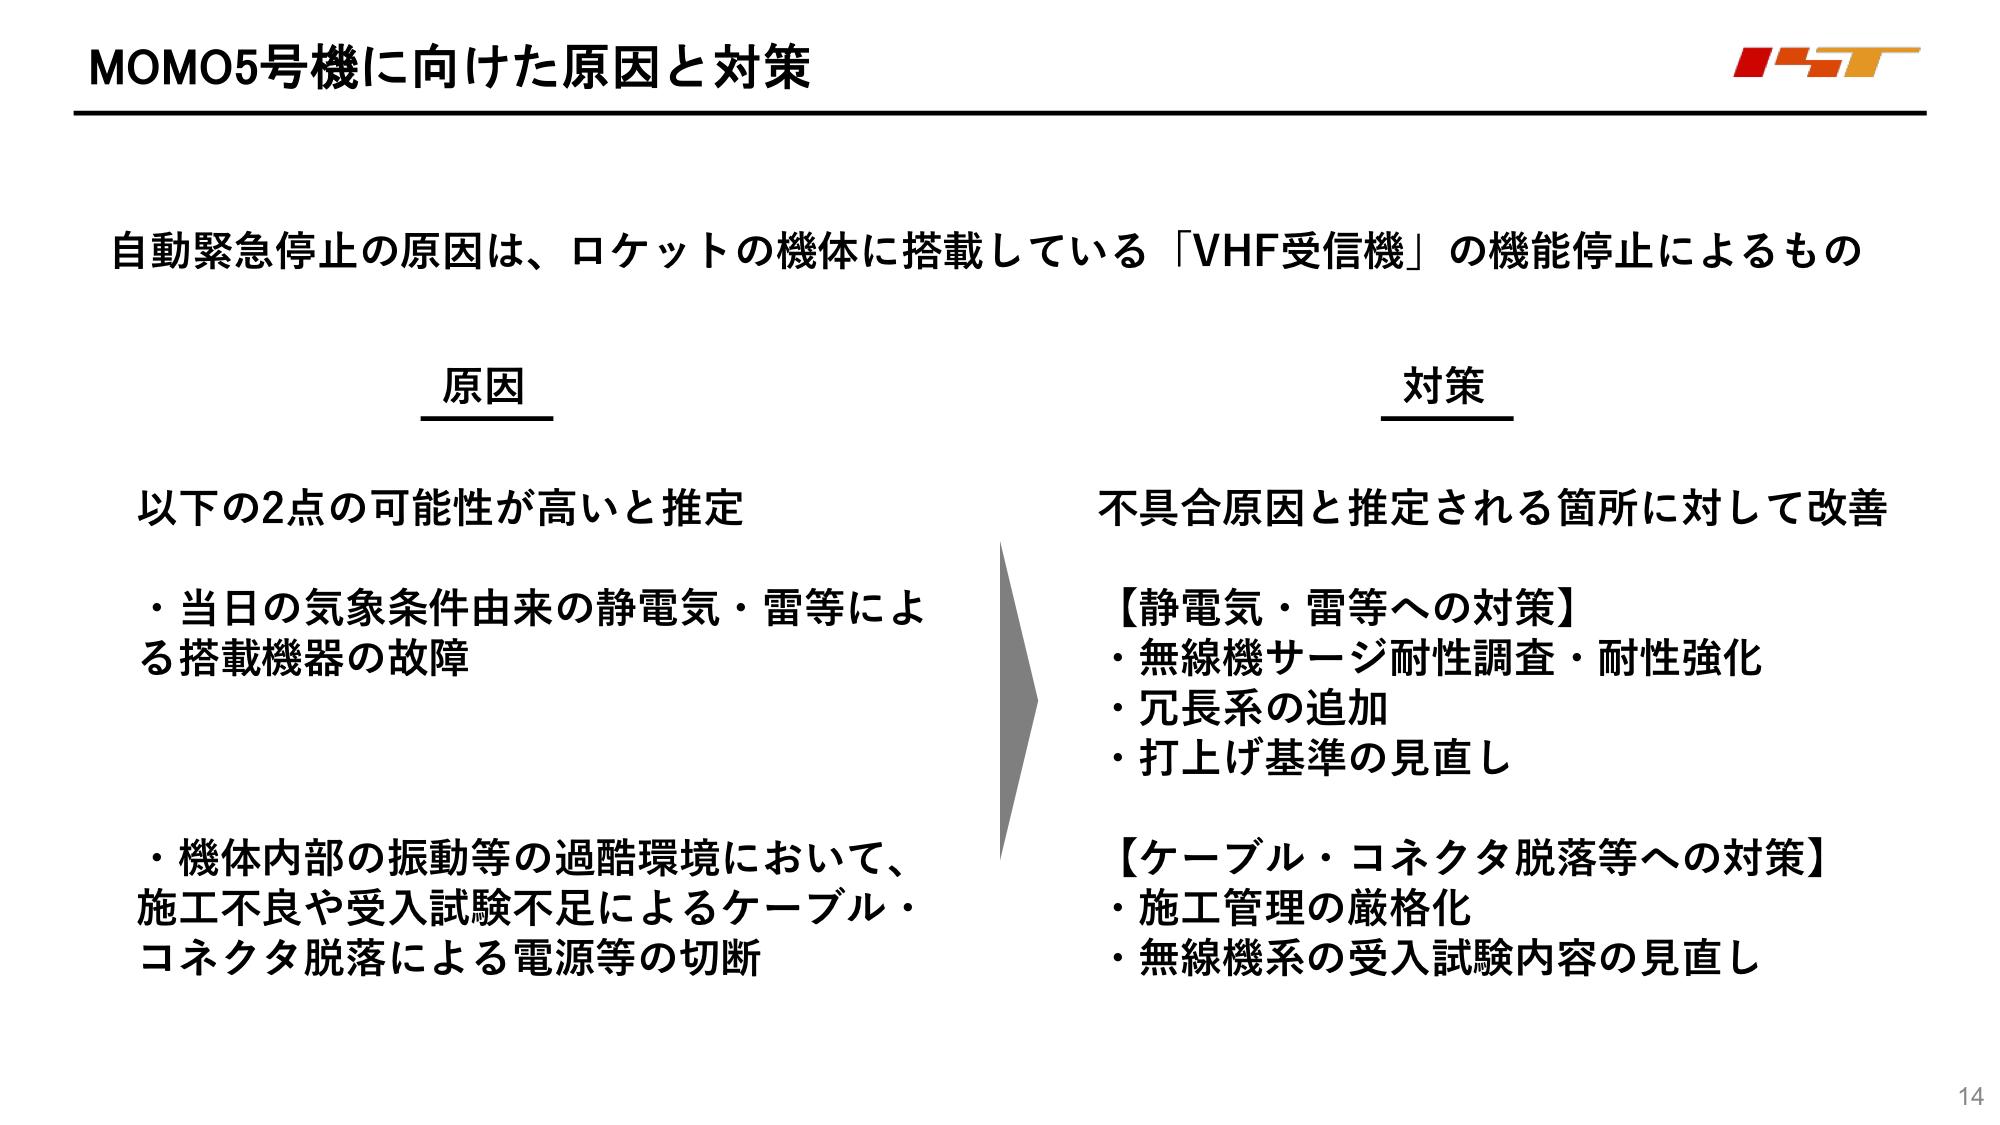 f:id:Imamura:20191126135122p:plain